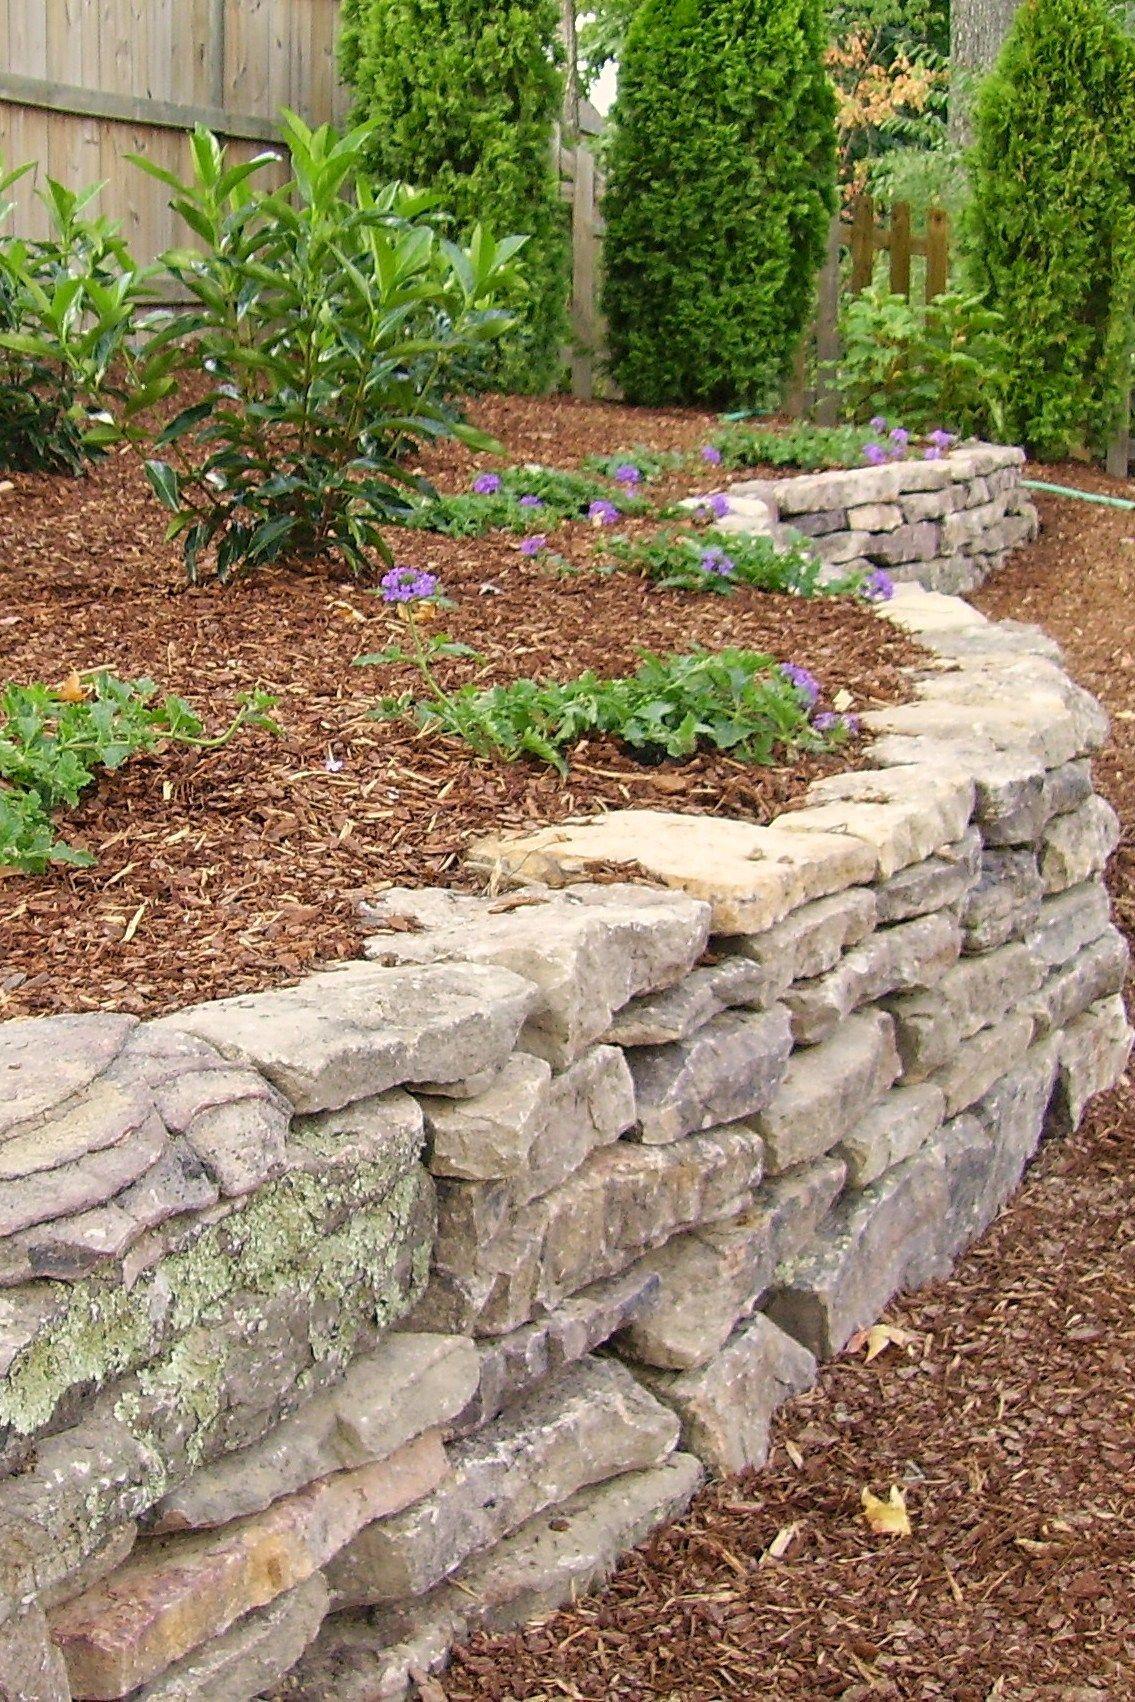 Dry Stacked Stone | Jardín con piedras | Pinterest | Dry stack stone on sloped vegetable garden, sloped raised flower beds, tiered garden beds, sloped landscape design, sloped garden design ideas,